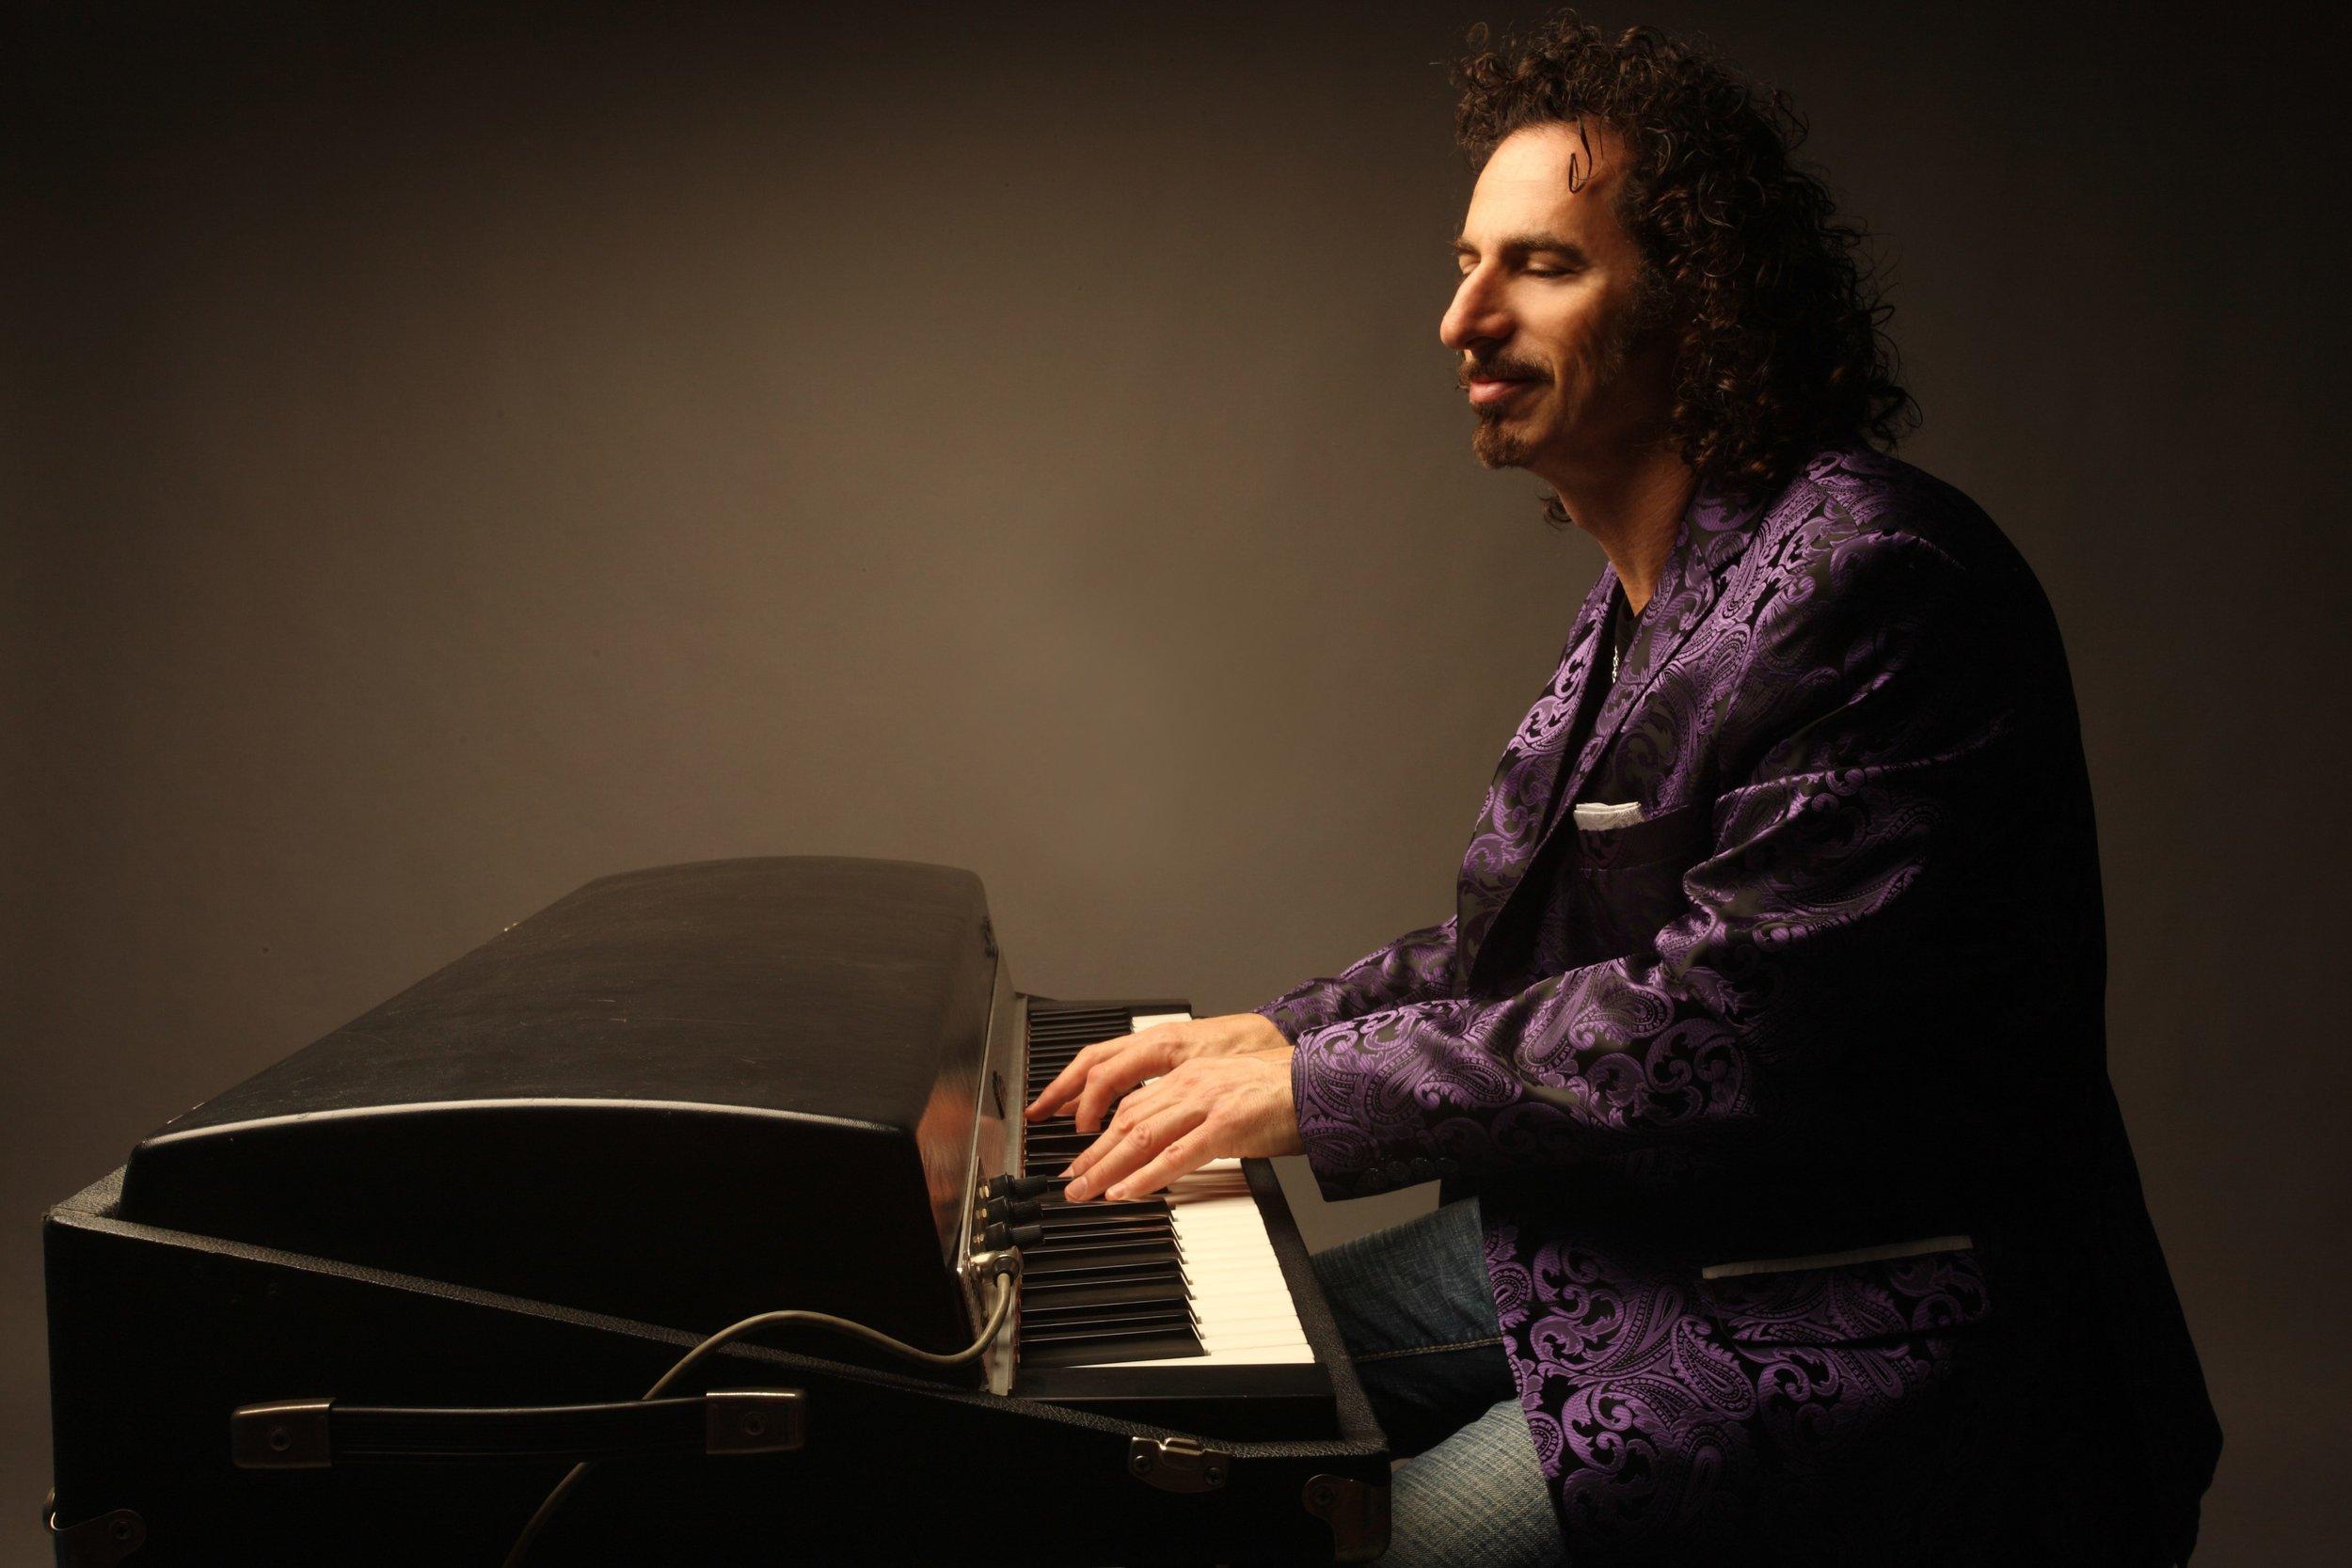 peter frampton, brothers johnson, annie lennox - ed - piano/keys